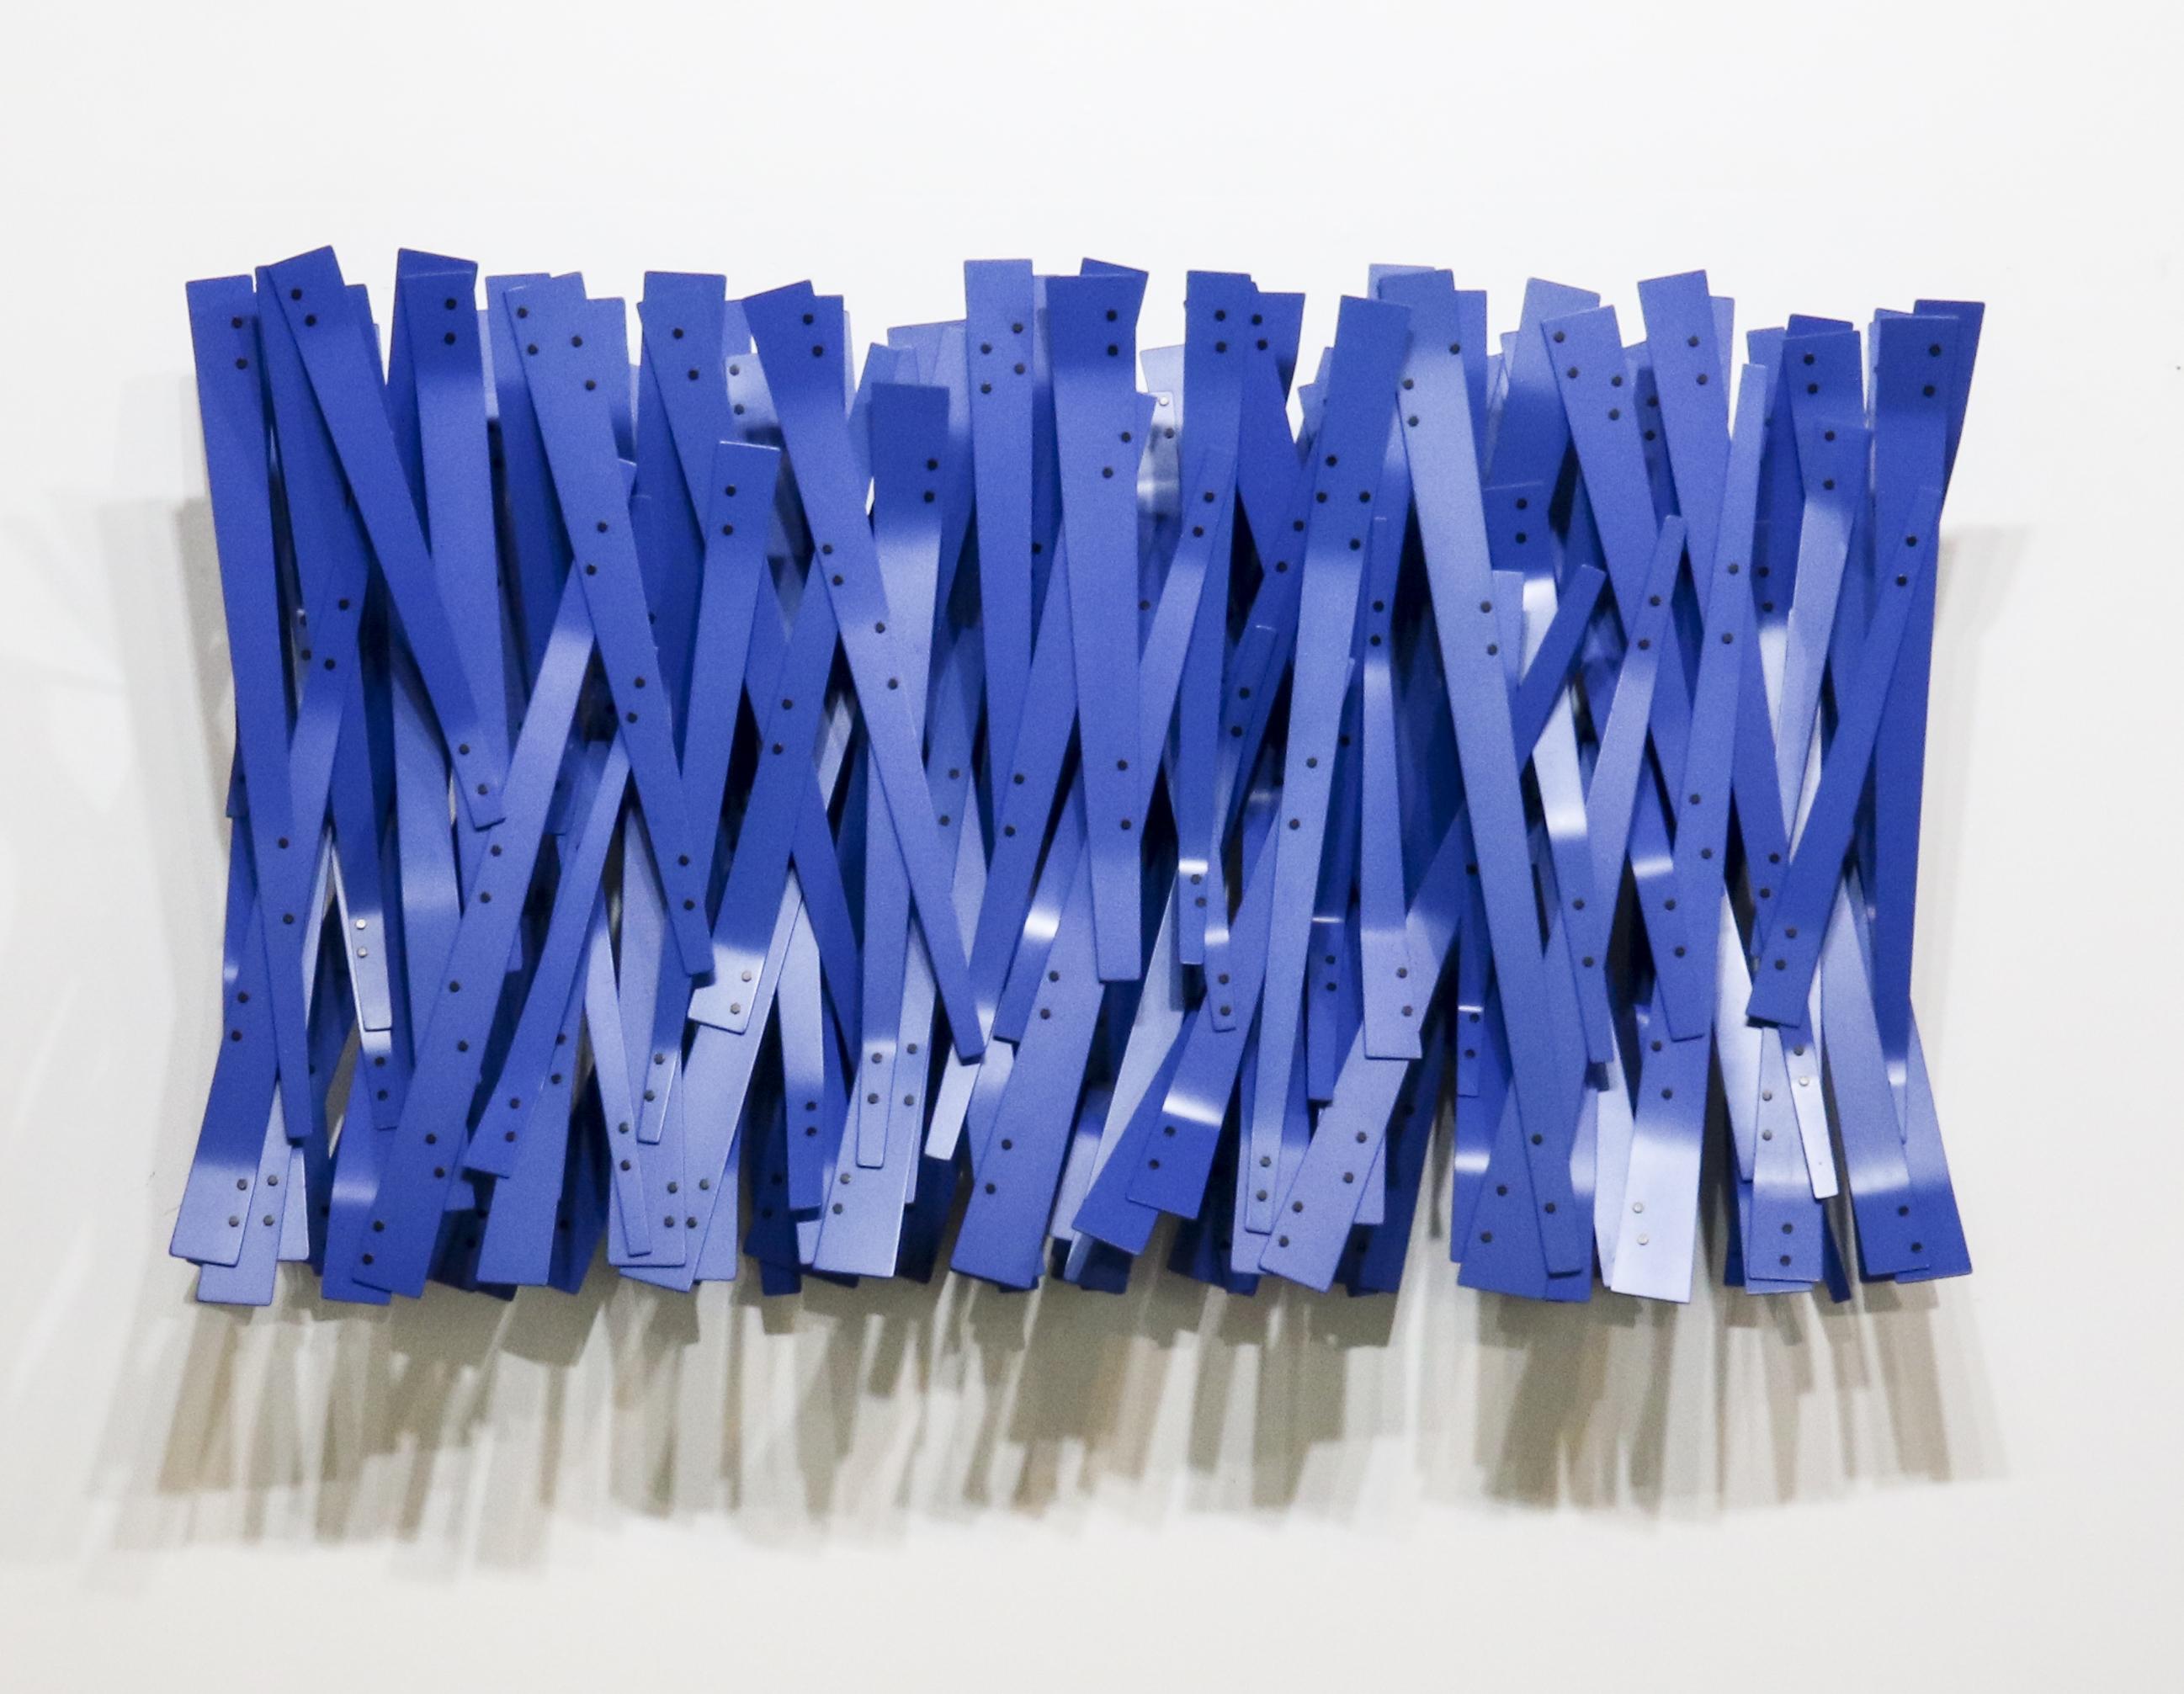 ricardo-cardenas-blue-forest-2018-painted-aluminum-722-x-1232--x--341-cm-1520440733